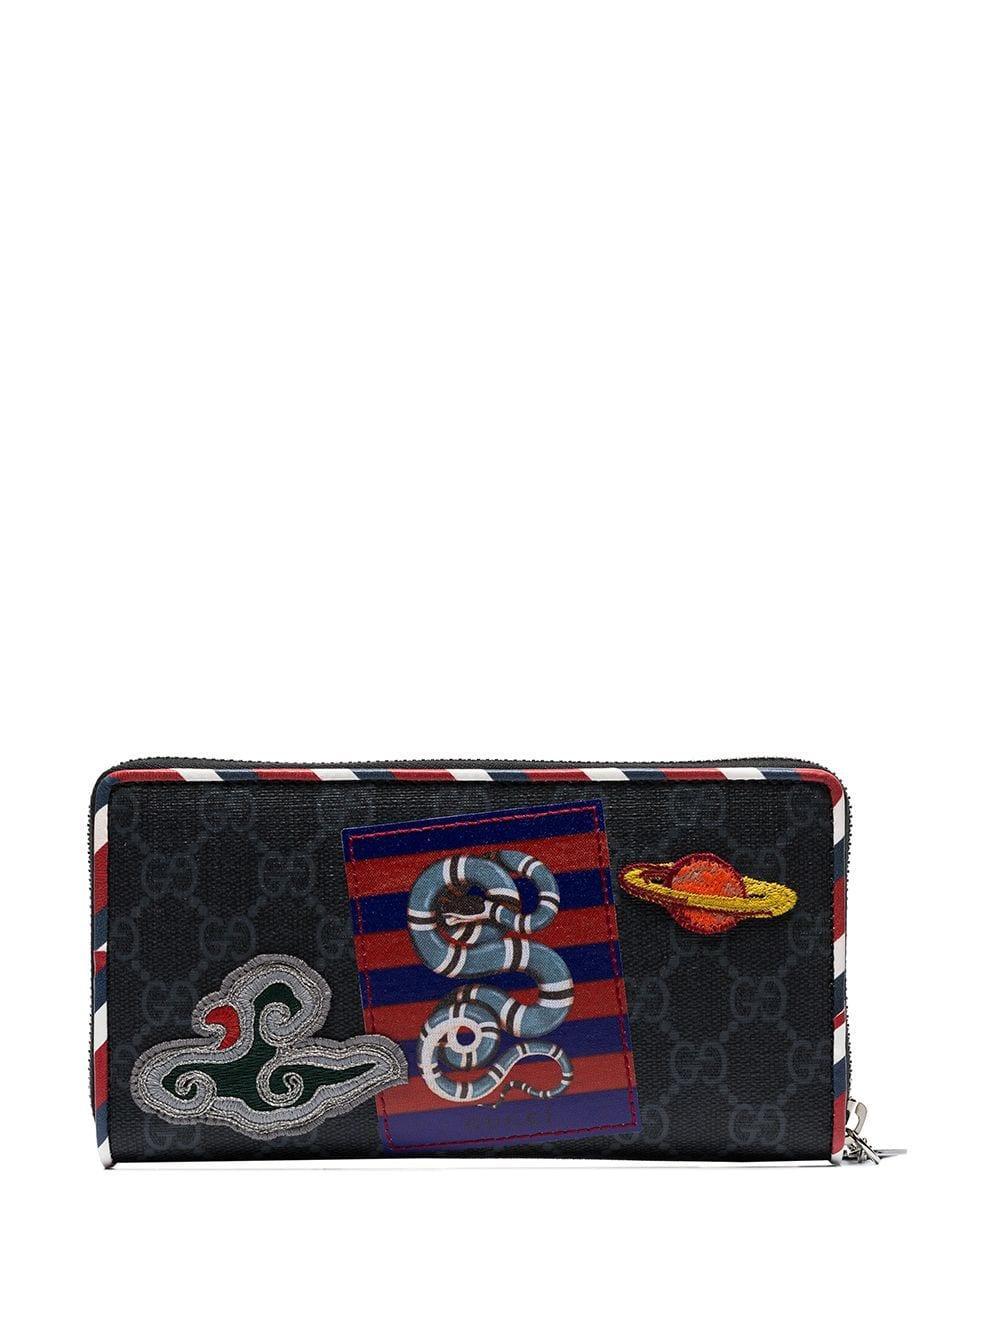 d78907440 Gucci - Black Night Courier Applique Canvas Wallet for Men - Lyst. View  fullscreen